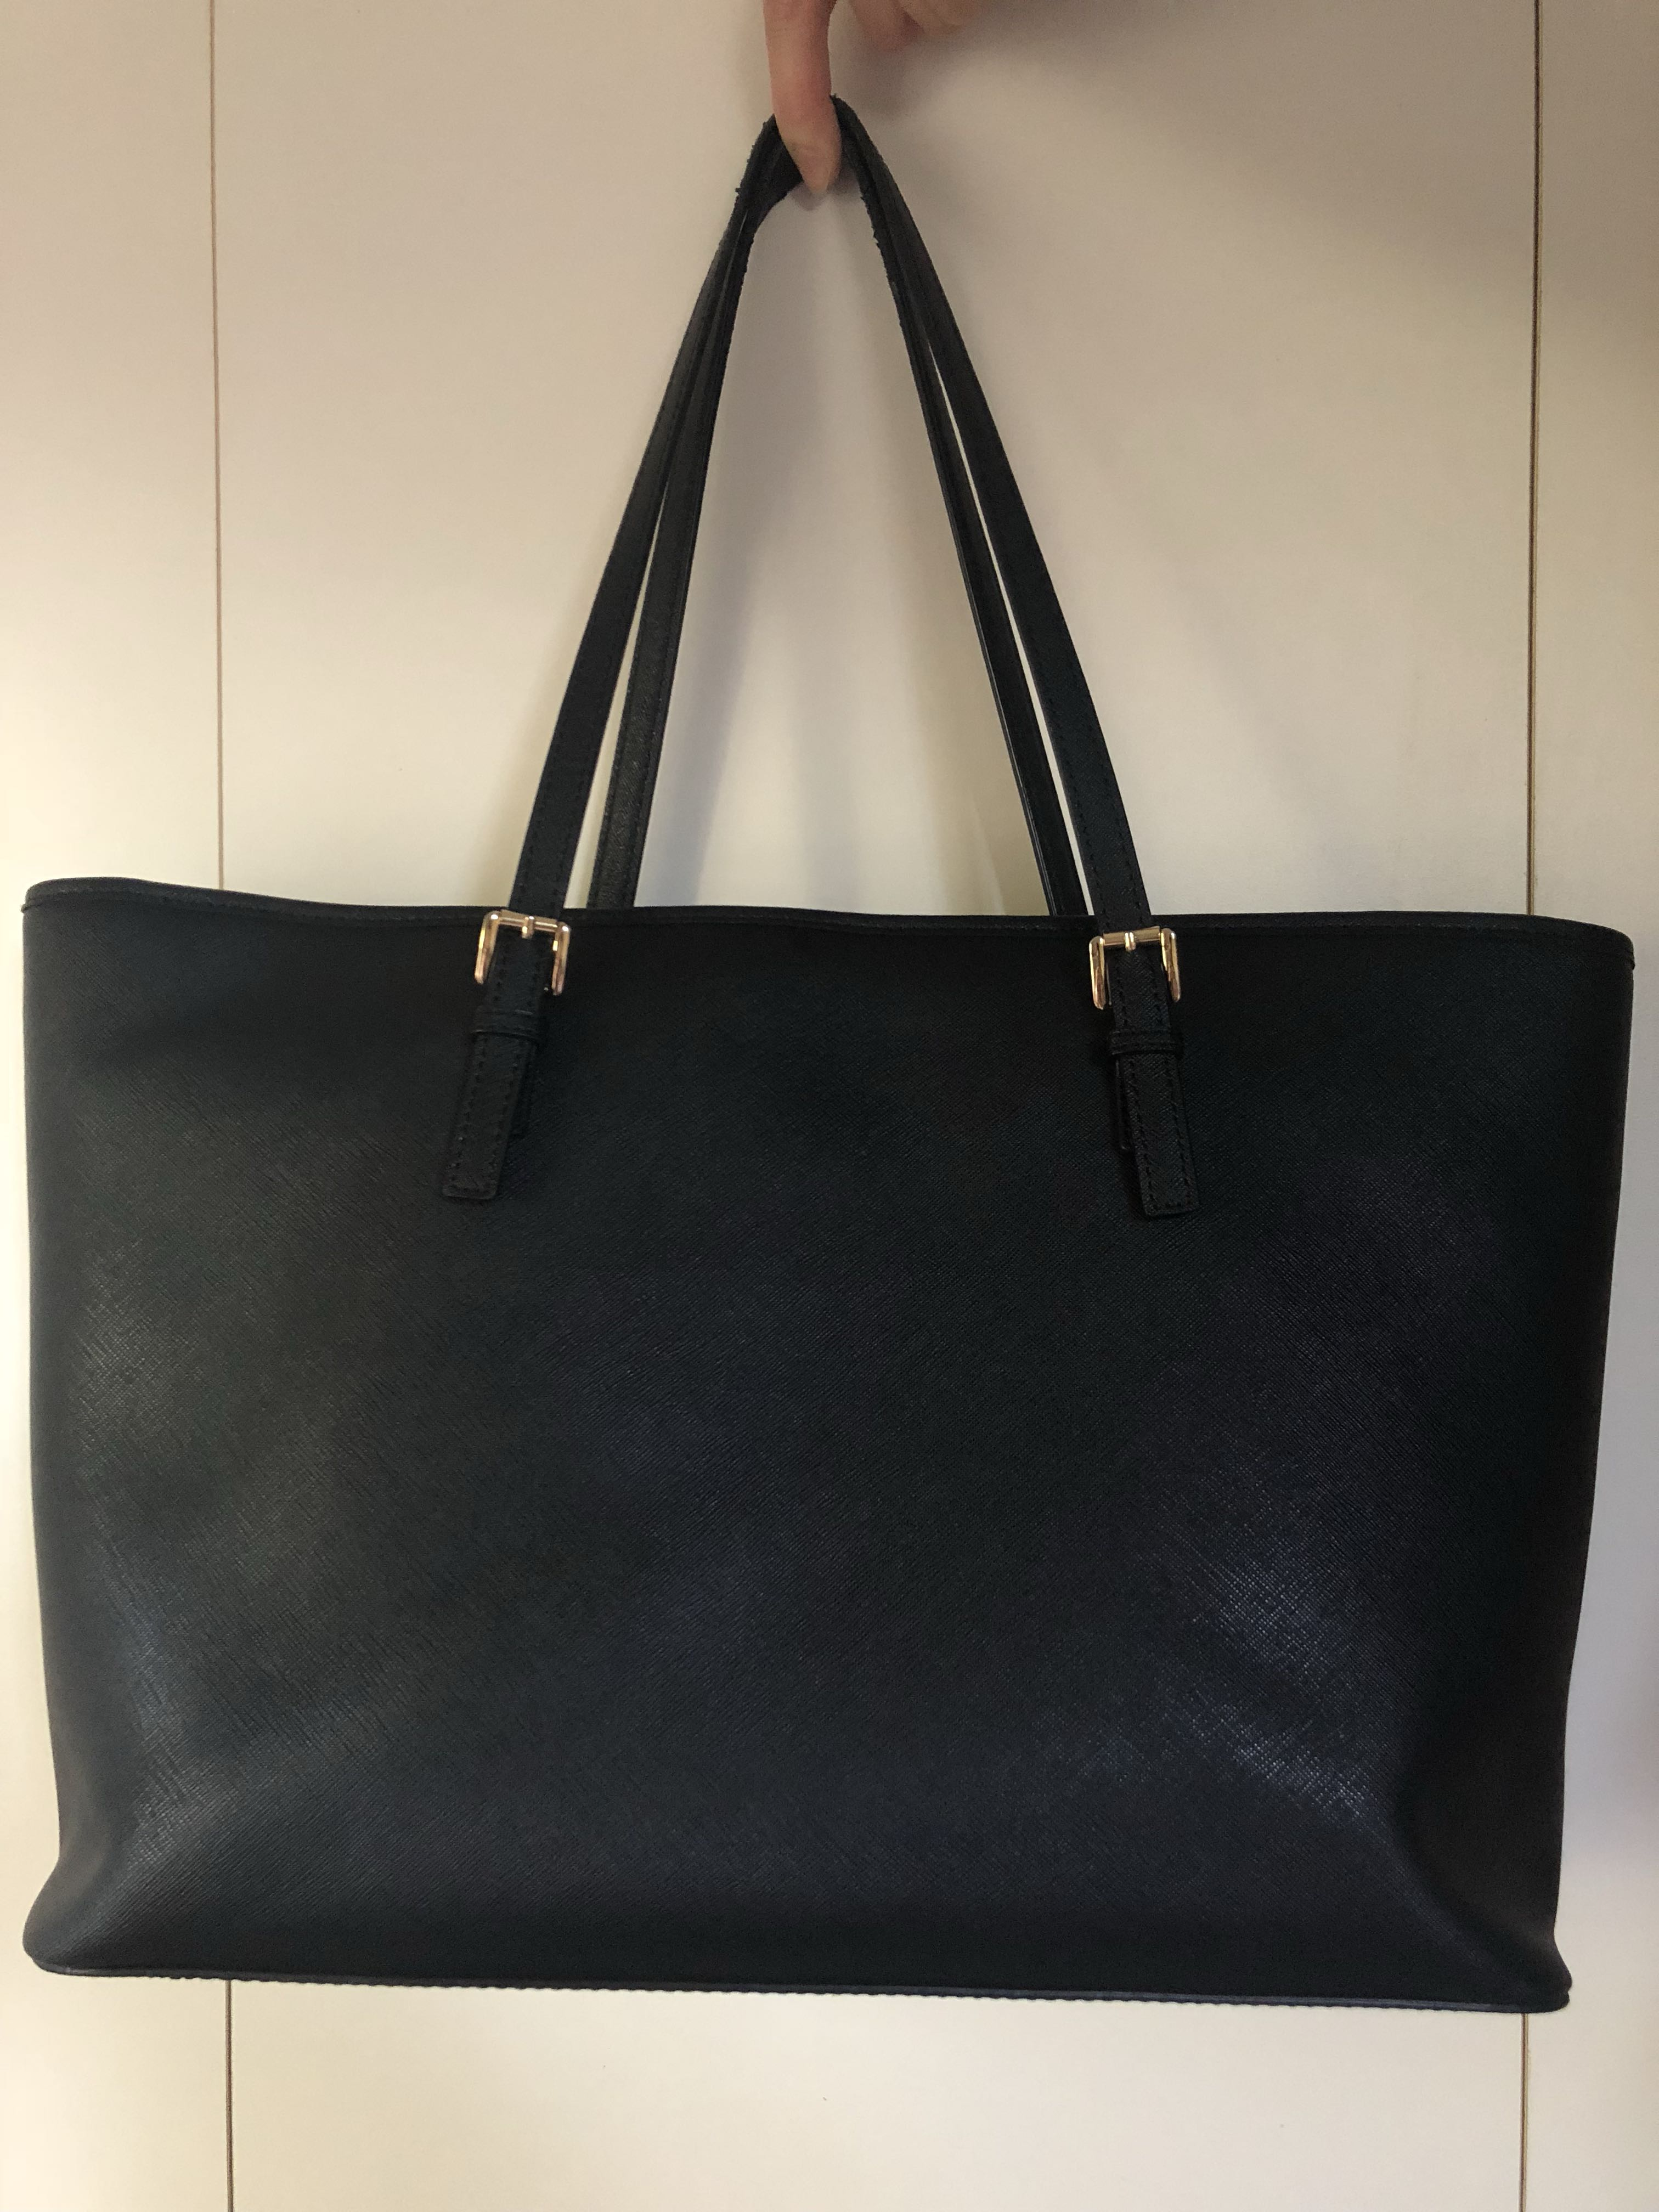 f6d5254aae4ace Michael Kors Black Jet Set Tote, Women's Fashion, Bags & Wallets on ...